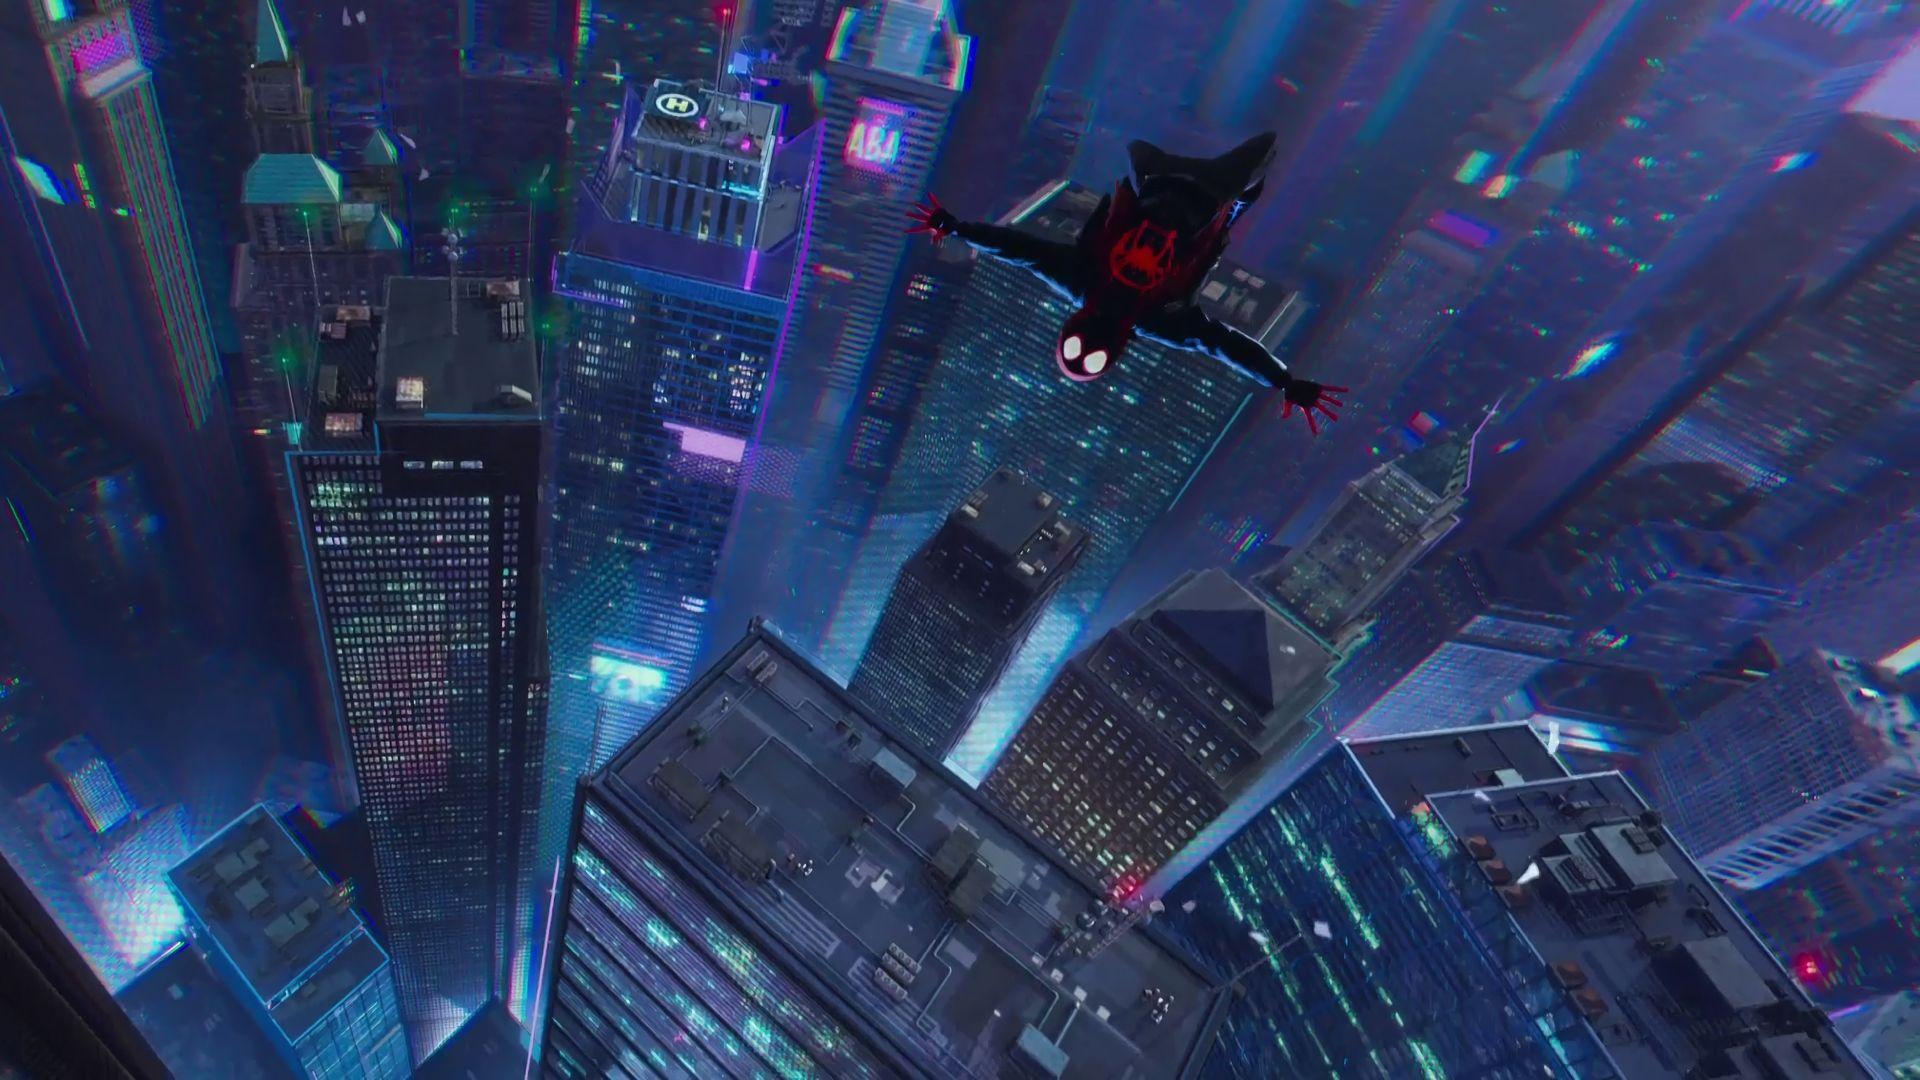 1920x1080 Hd Wallpaper Of Spider Man Into The Spider Verse Movie